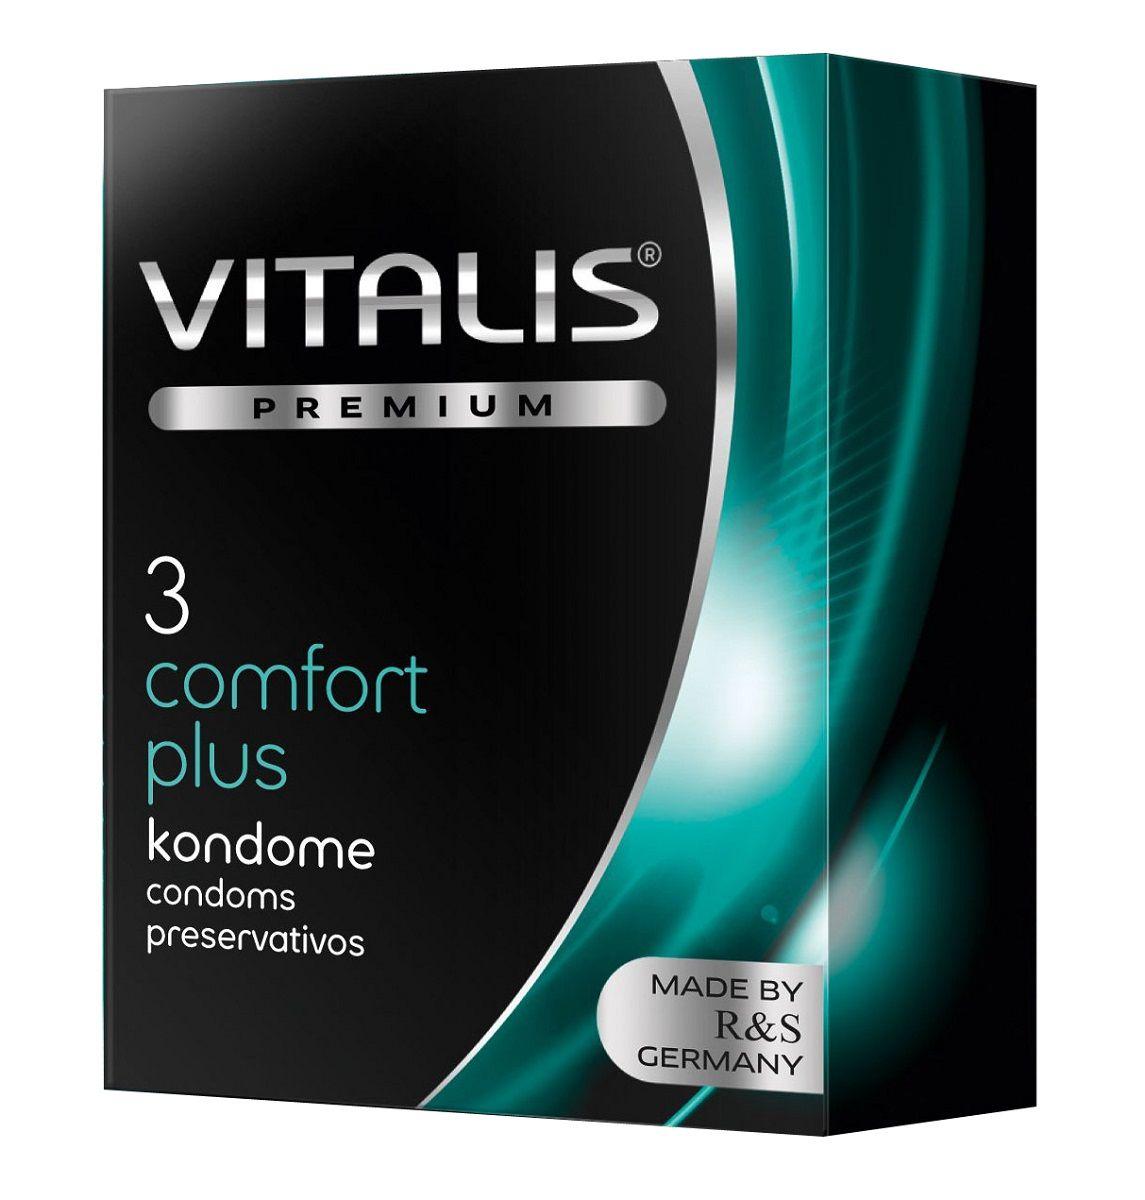 Контурные презервативы VITALIS PREMIUM comfort plus - 3 шт. - фото 136933